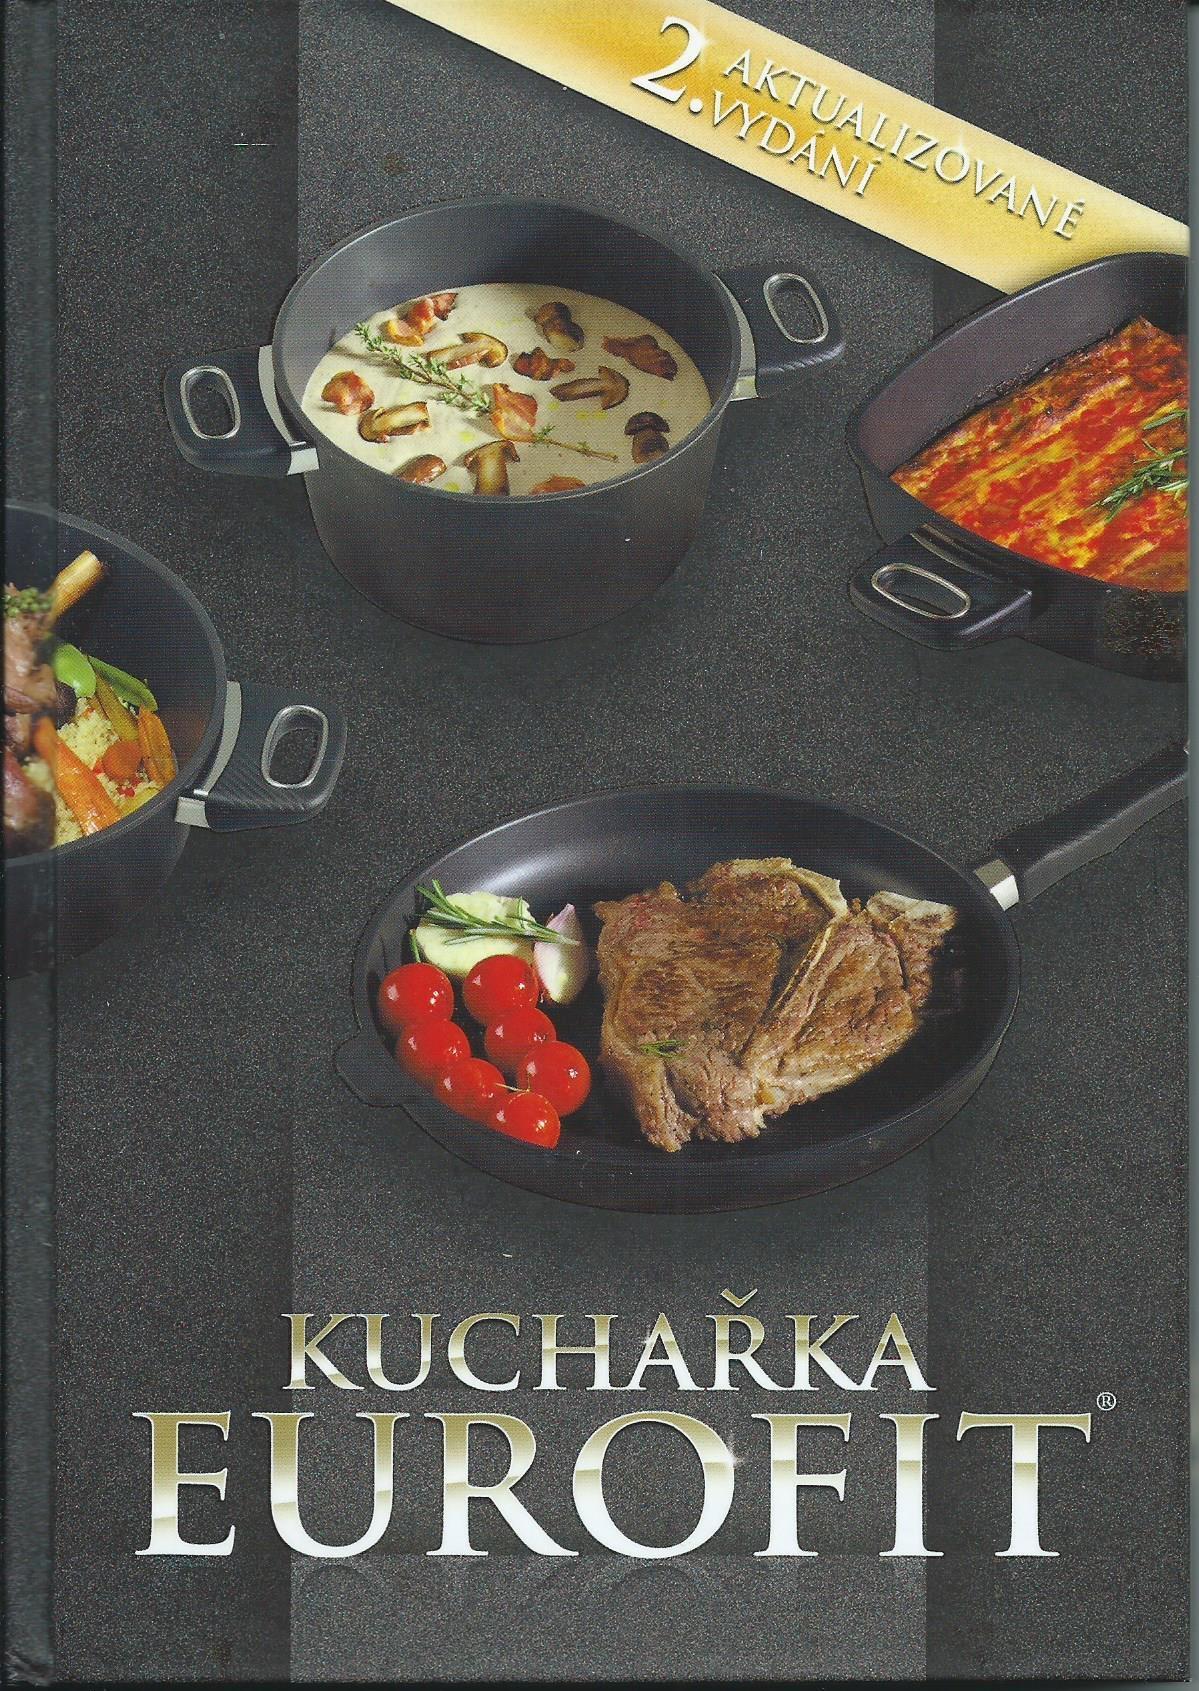 Kuchařka eurofit